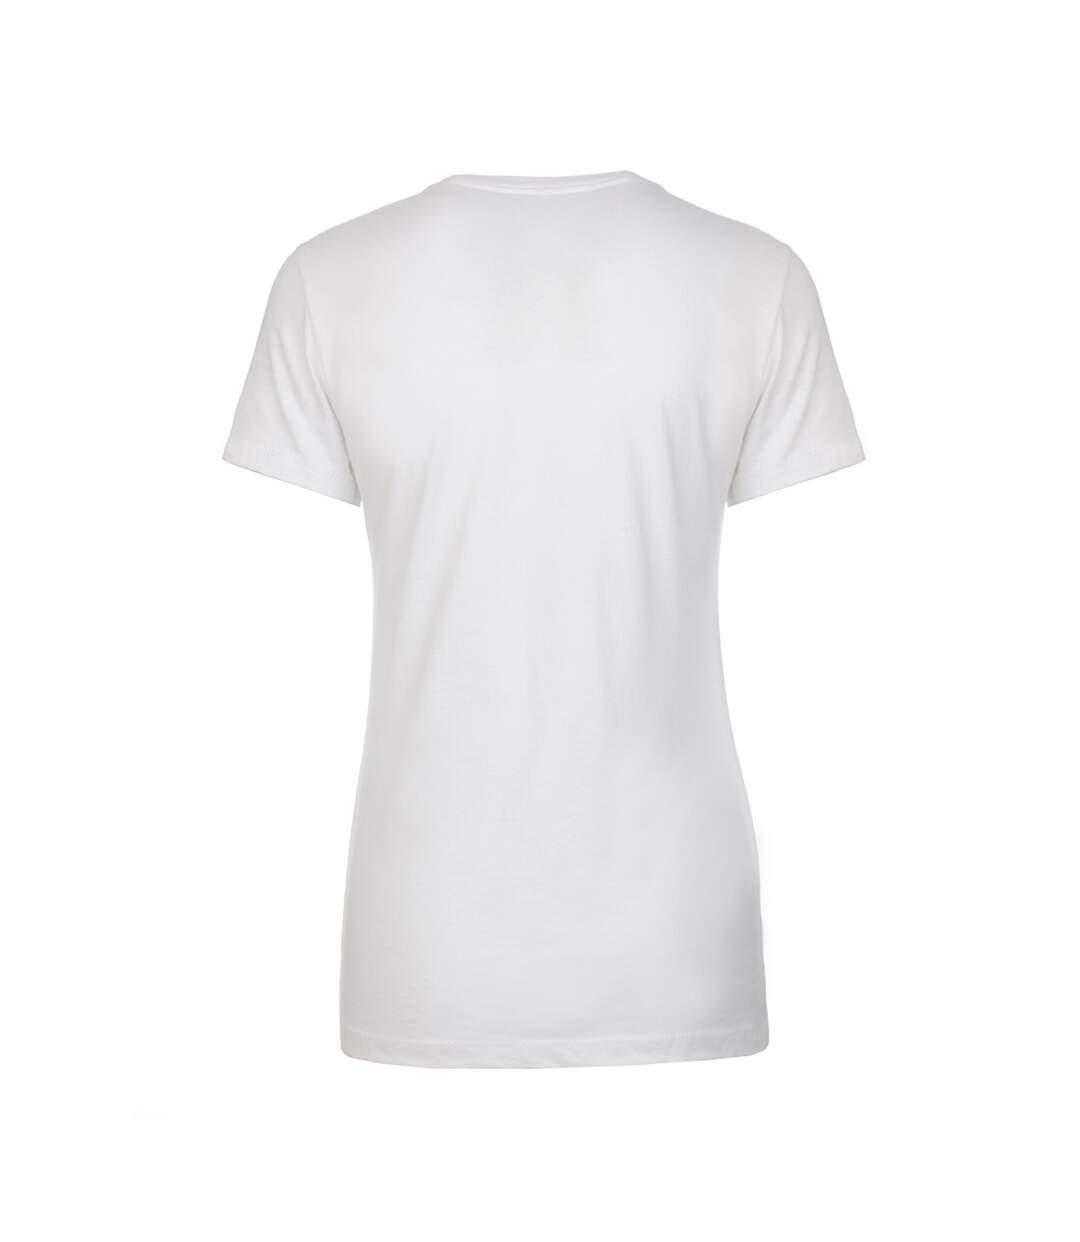 Next Level - T-Shirt - Femme (Blanc) - UTPC3466